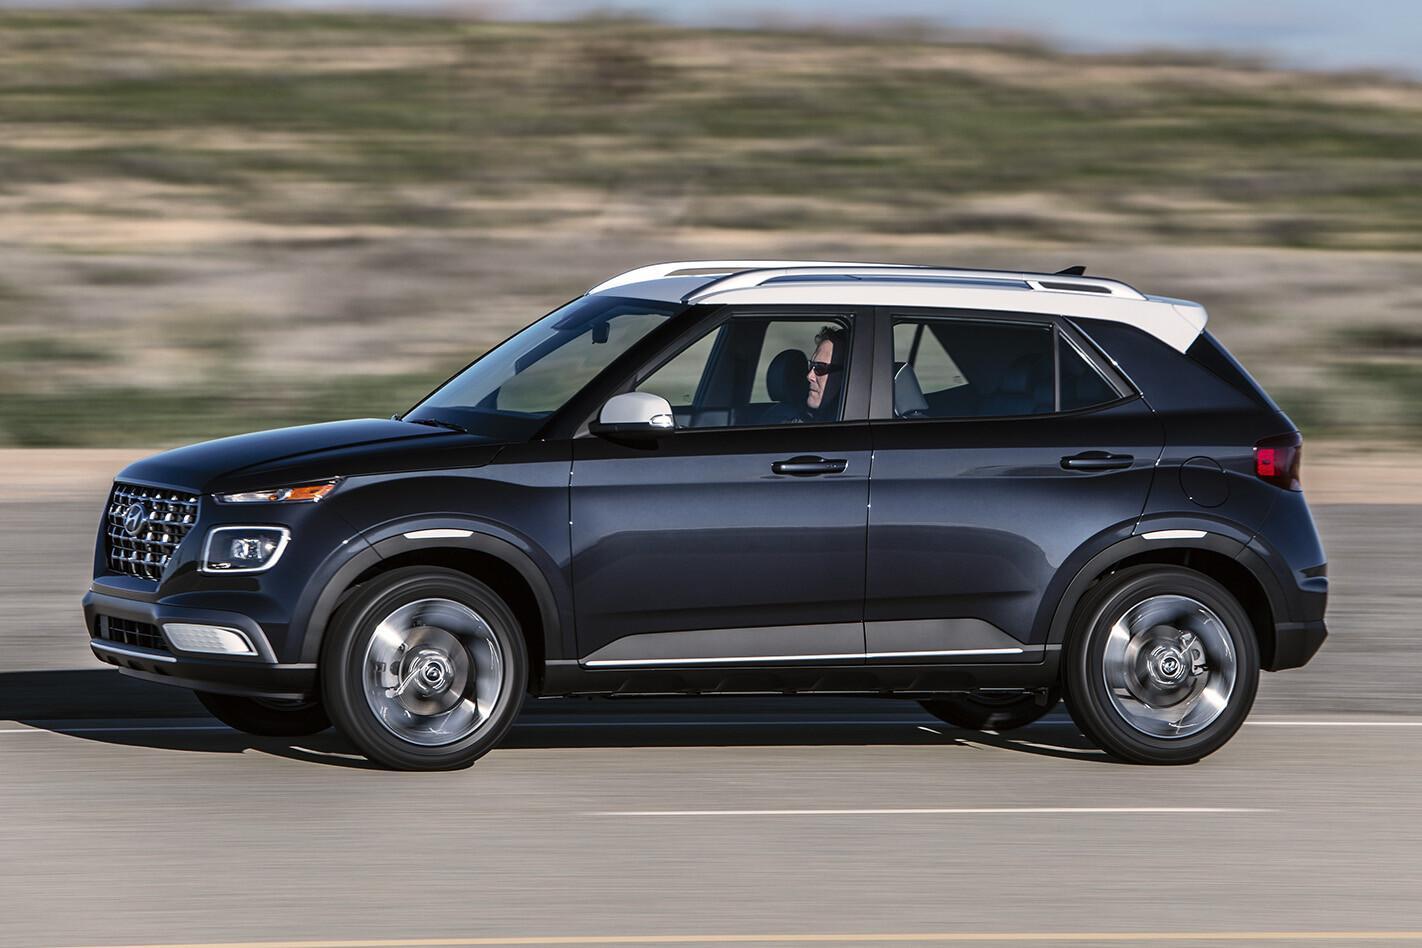 2020 Hyundai Venue Front Side Action Jpeg